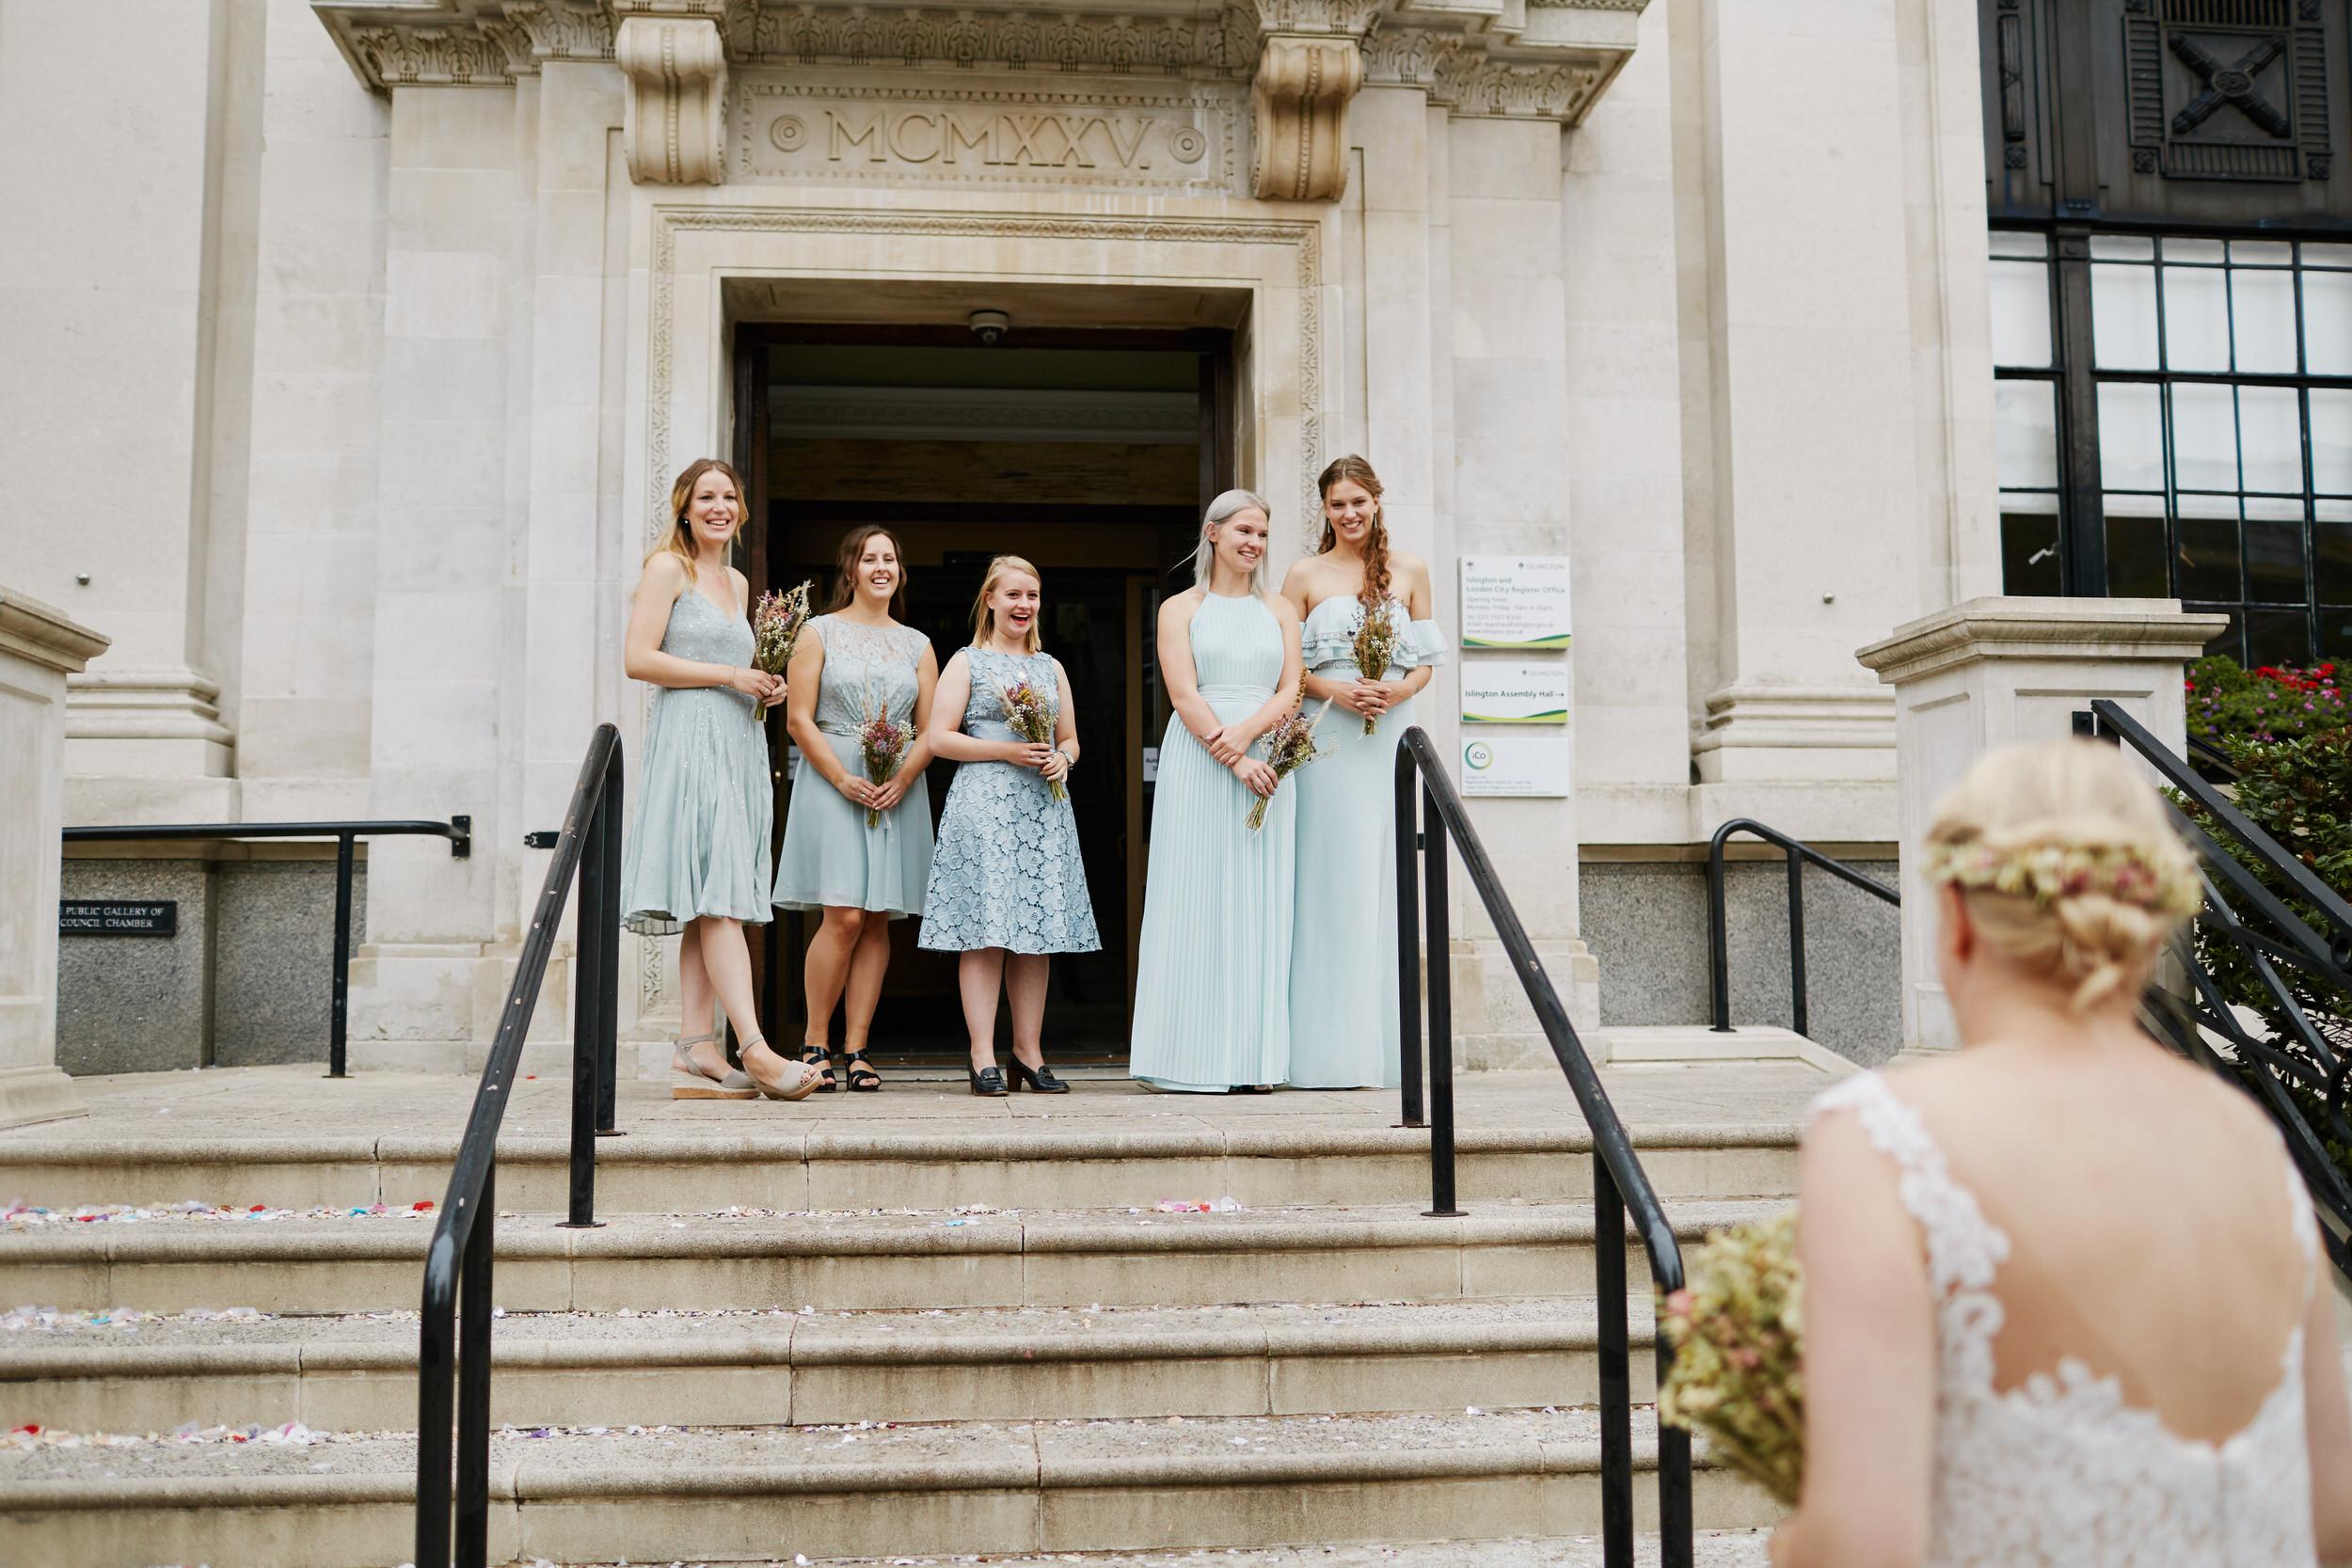 Wedding in London - Echoes & Wild Hearts 0011.jpg